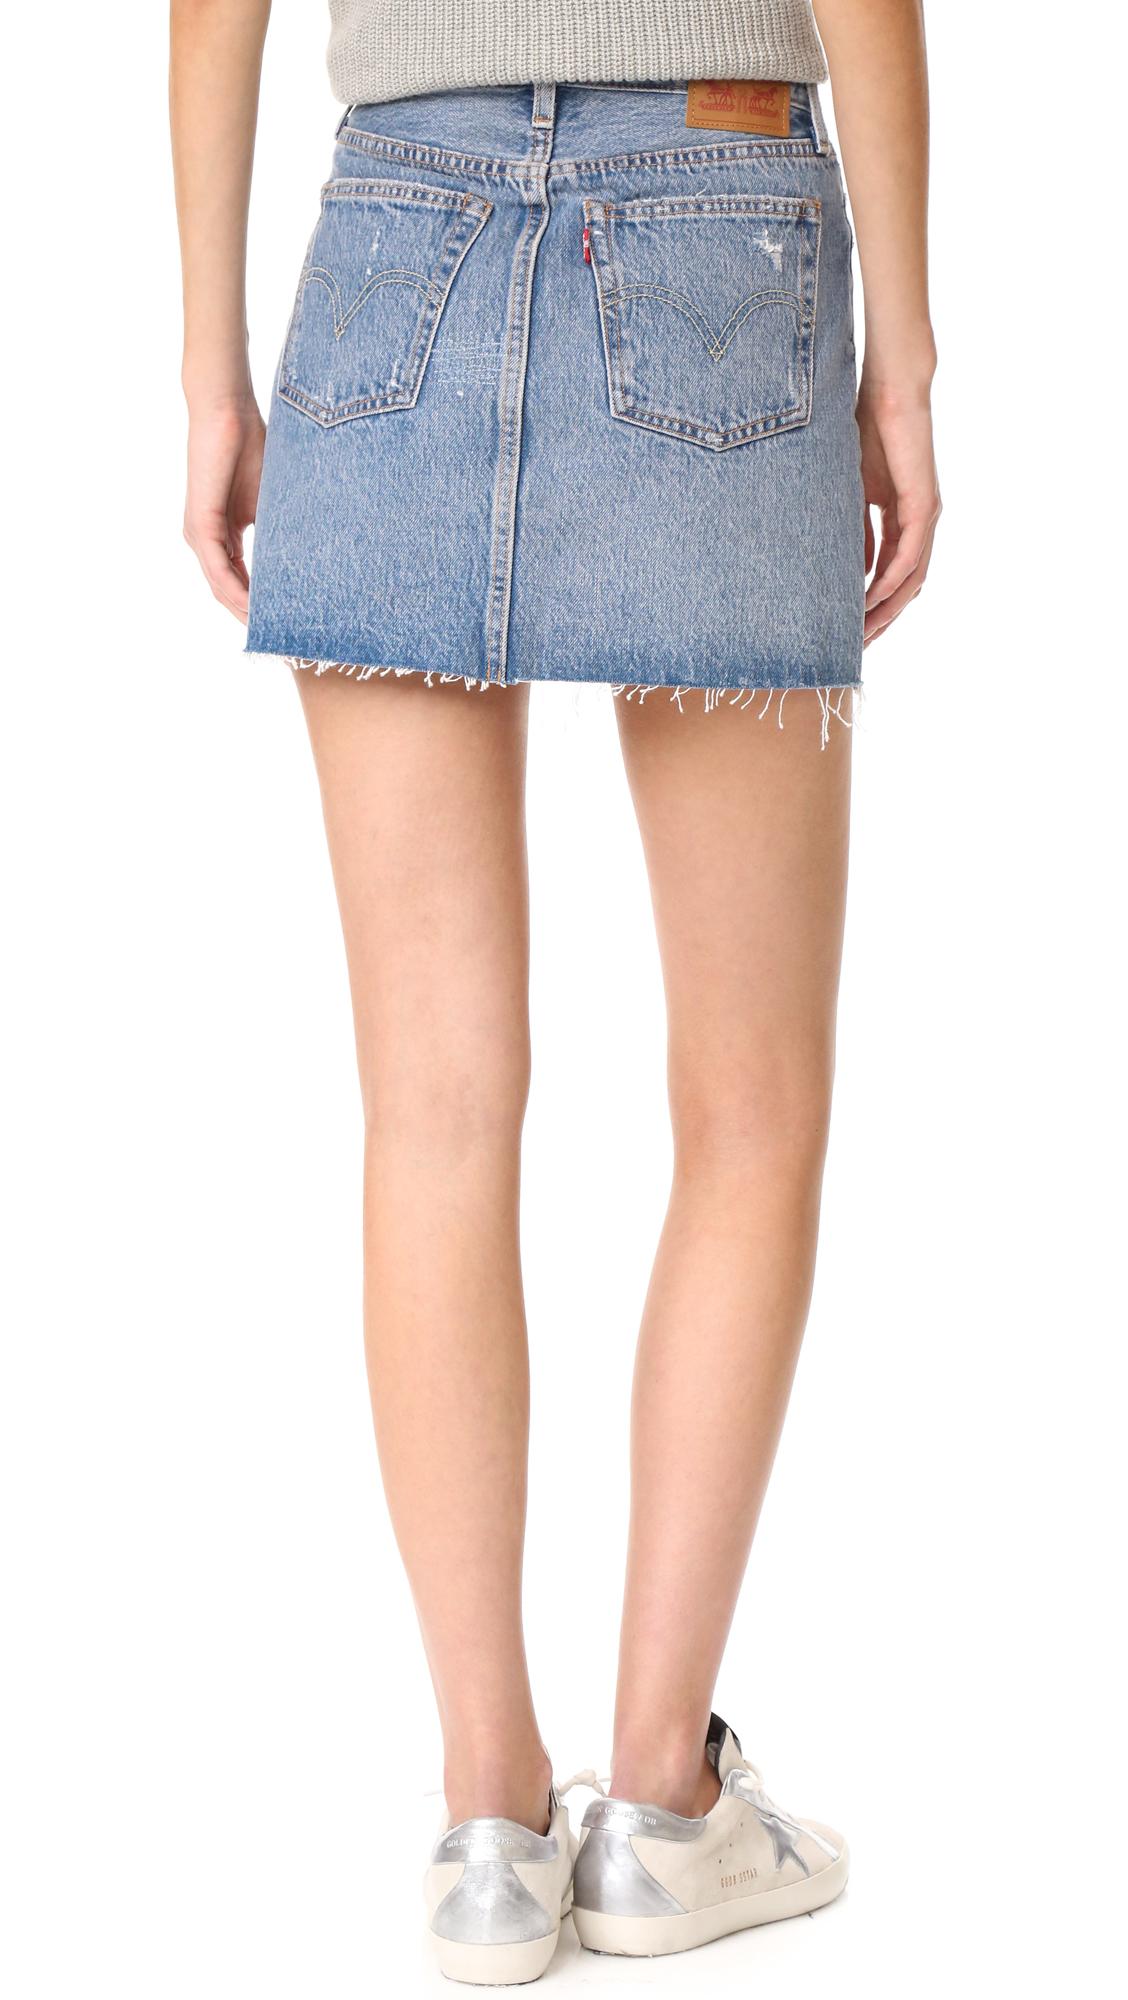 02c12c3862 Levi s Deconstructed Skirt